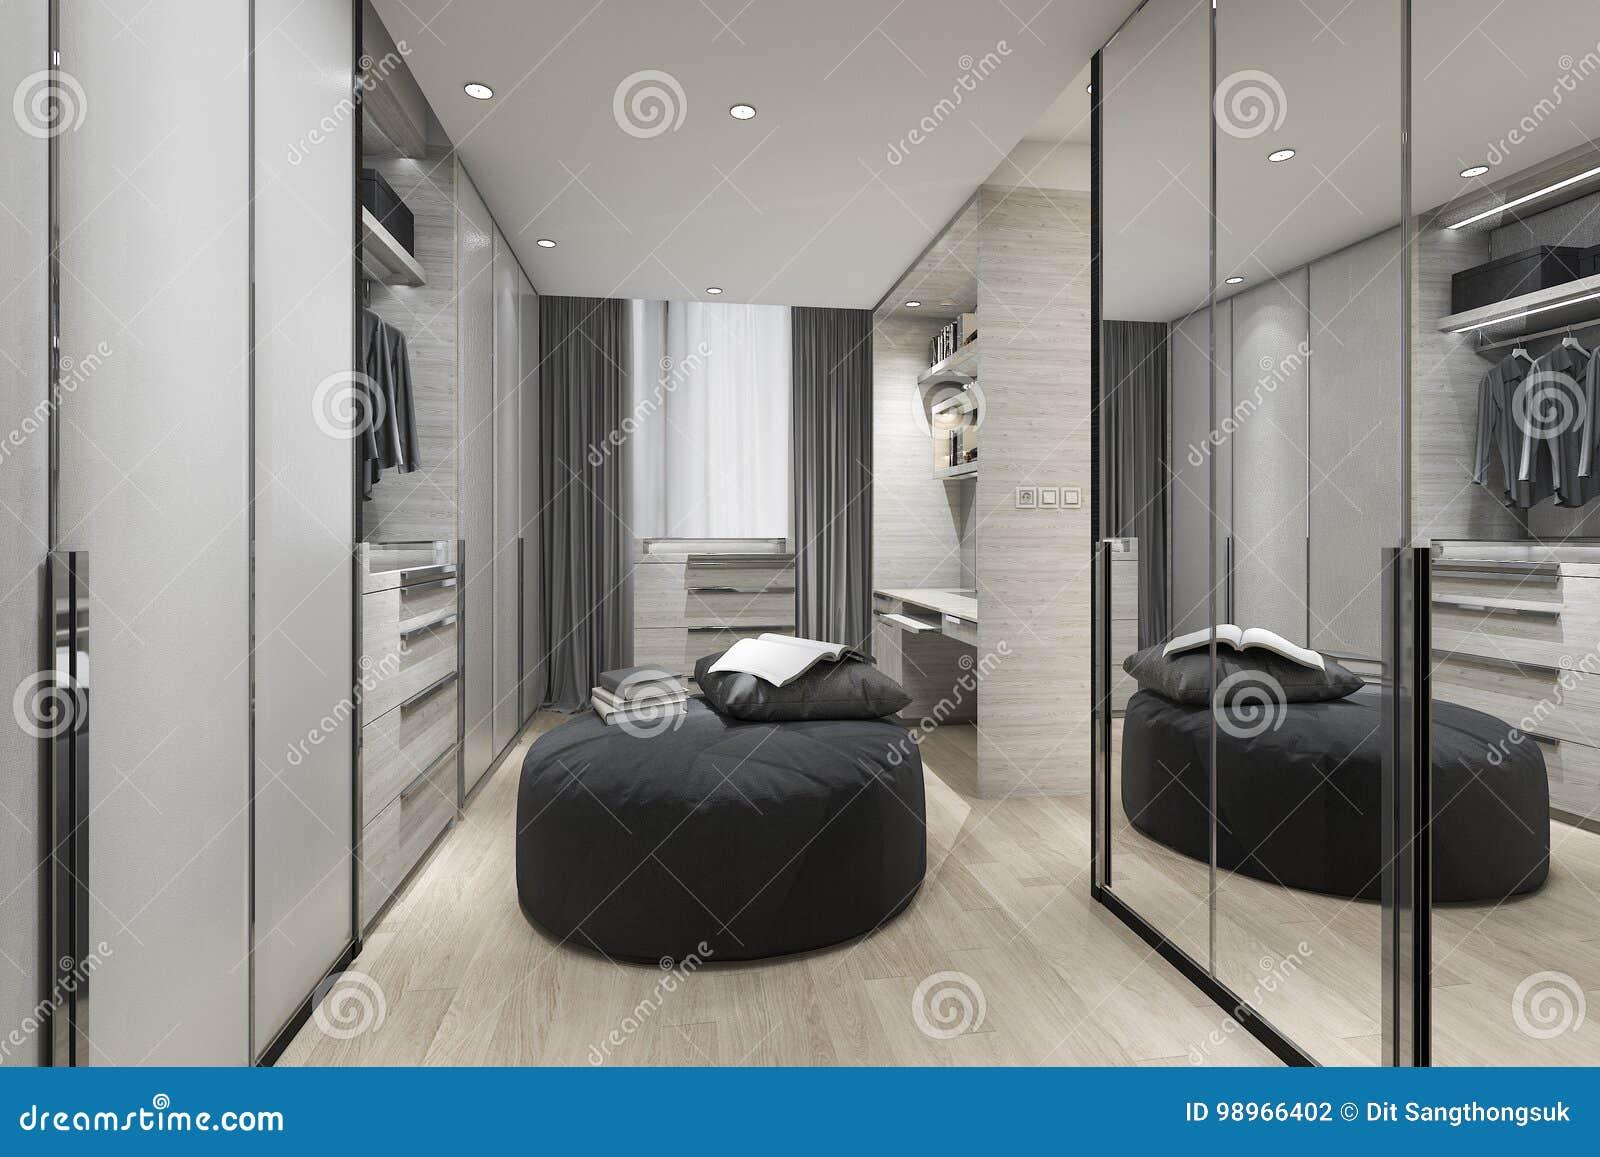 3d Rendering Black Cushion In Scandinavian Walk In Closet With